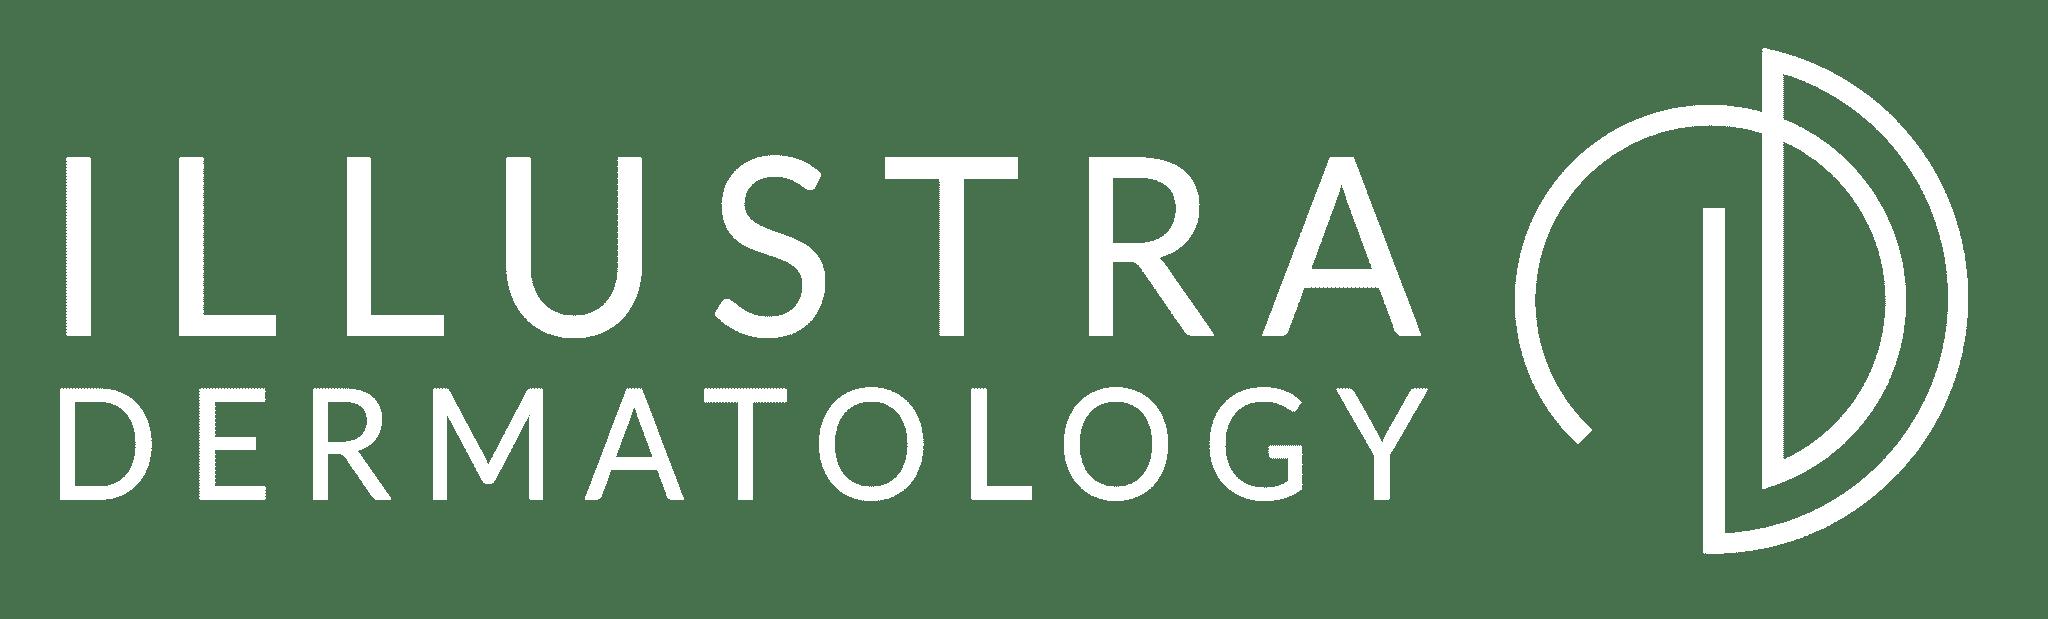 illustra dermatology logo white